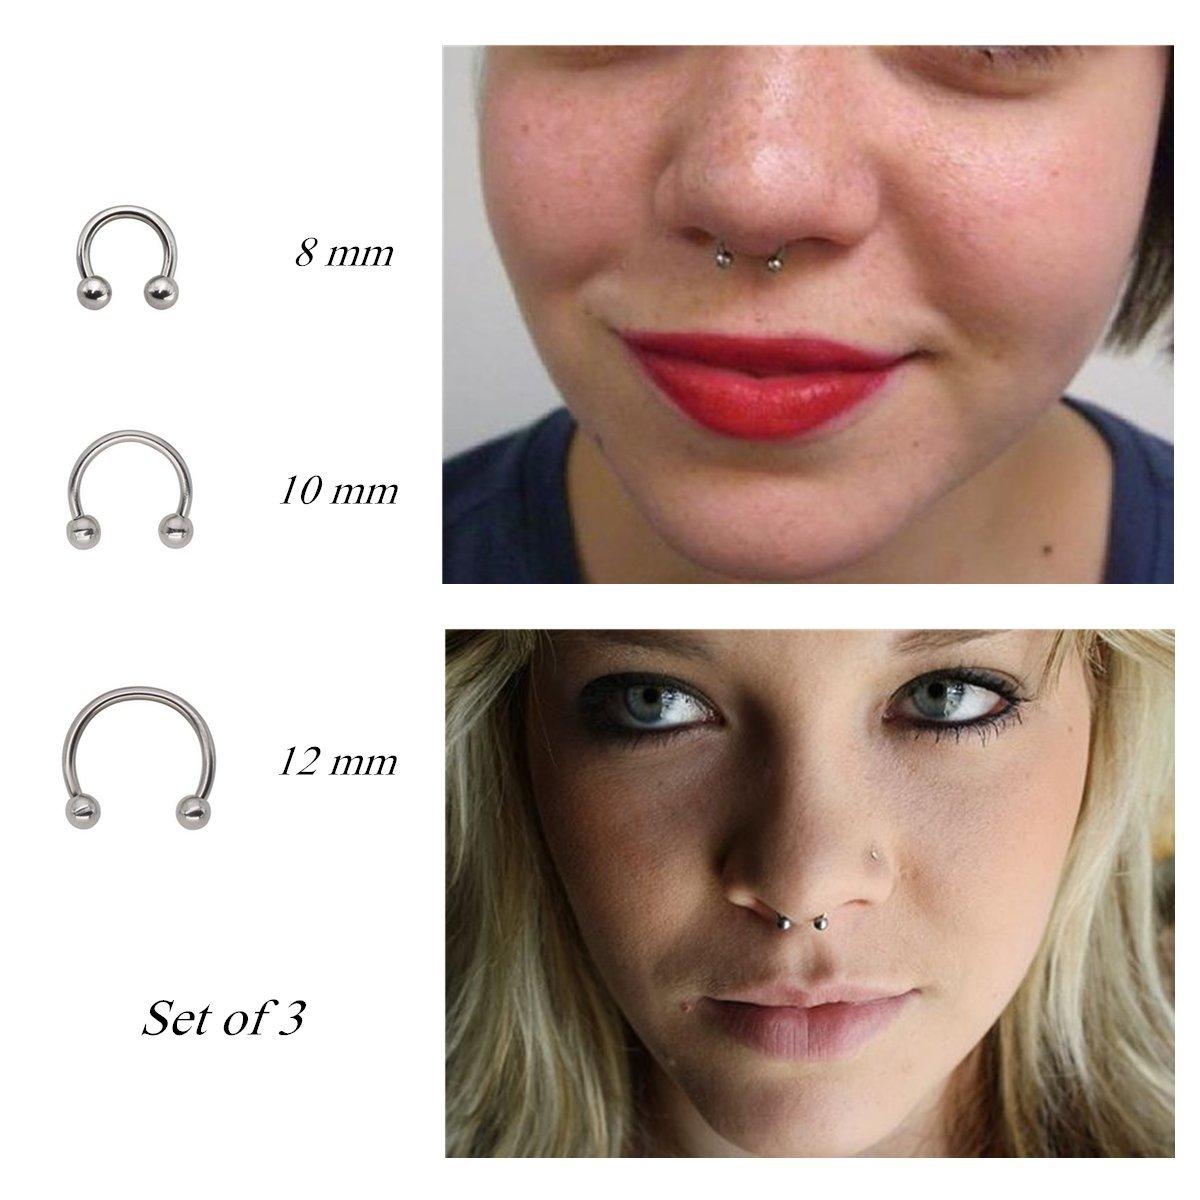 Pamido Bull Nose Ring Horseshoe Hoop Nose Rings Cartilage Earring Nose Septum Nose Nostril Stainless Steel for Women Girls Men